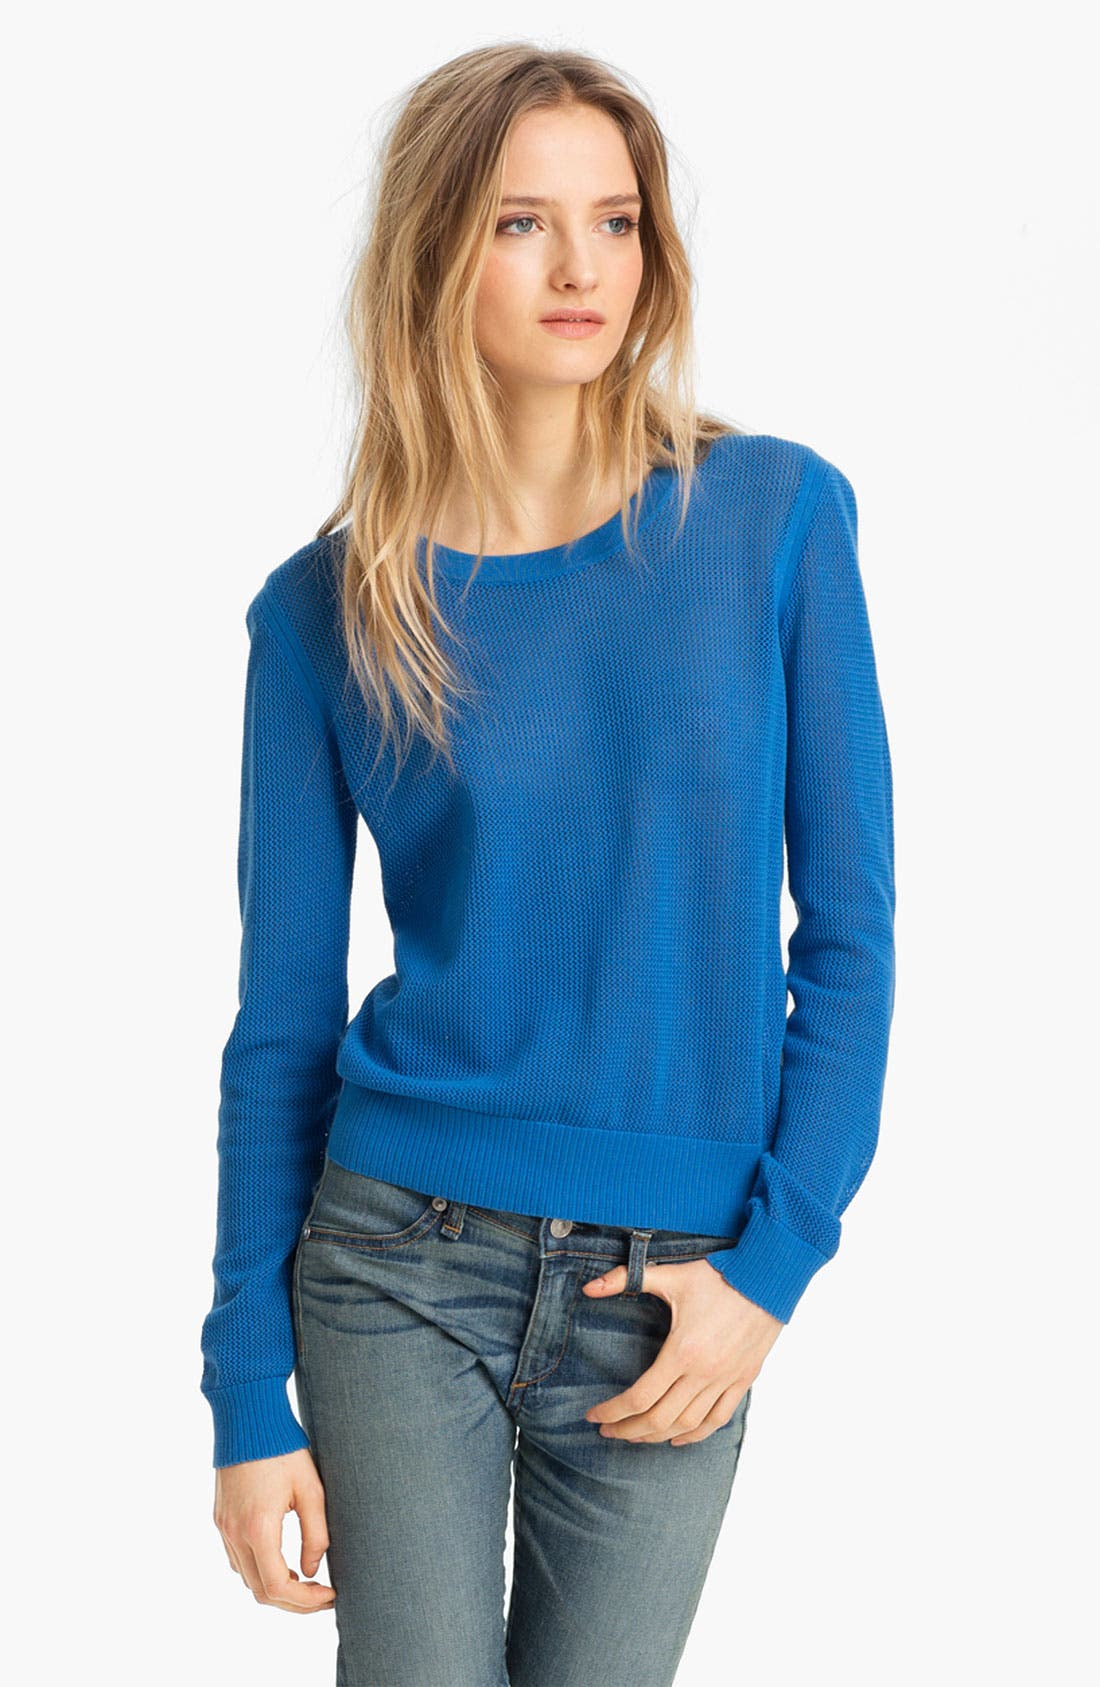 Alternate Image 1 Selected - rag & bone/JEAN 'Katya' Sweater